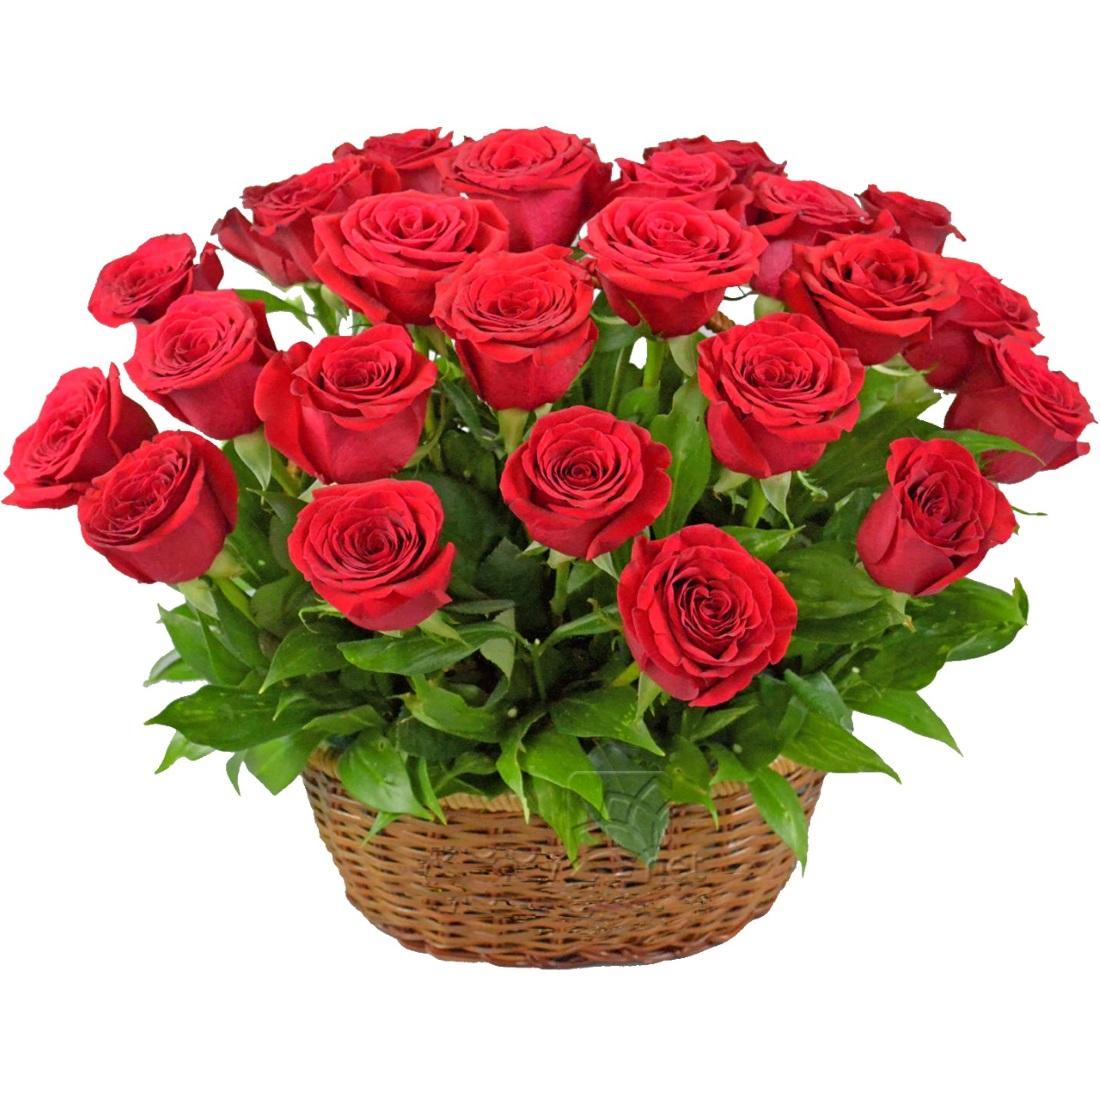 Картинка, открытки с корзинками роз